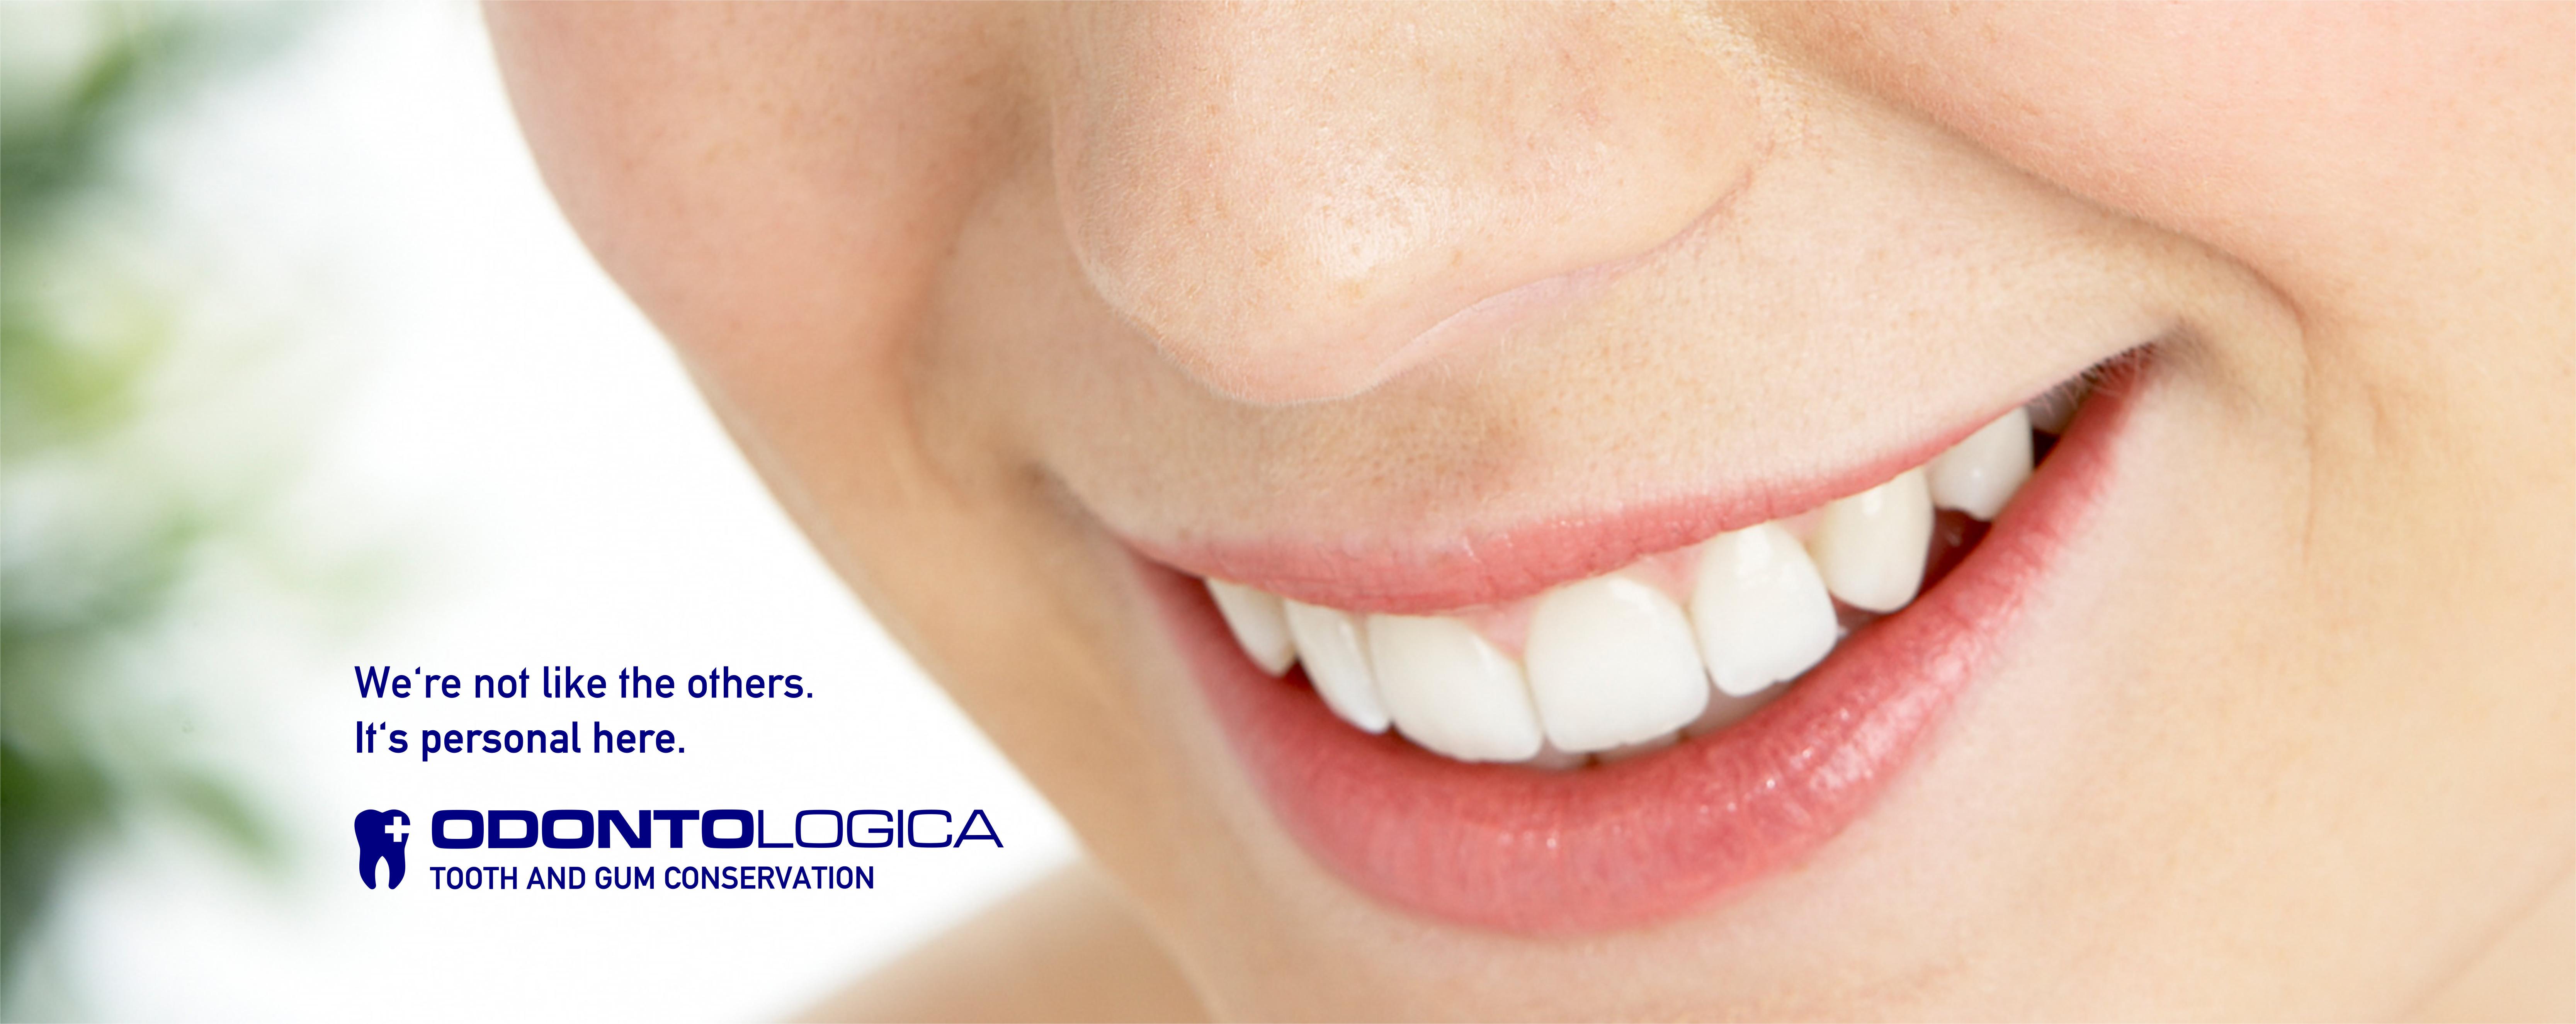 Odontologica